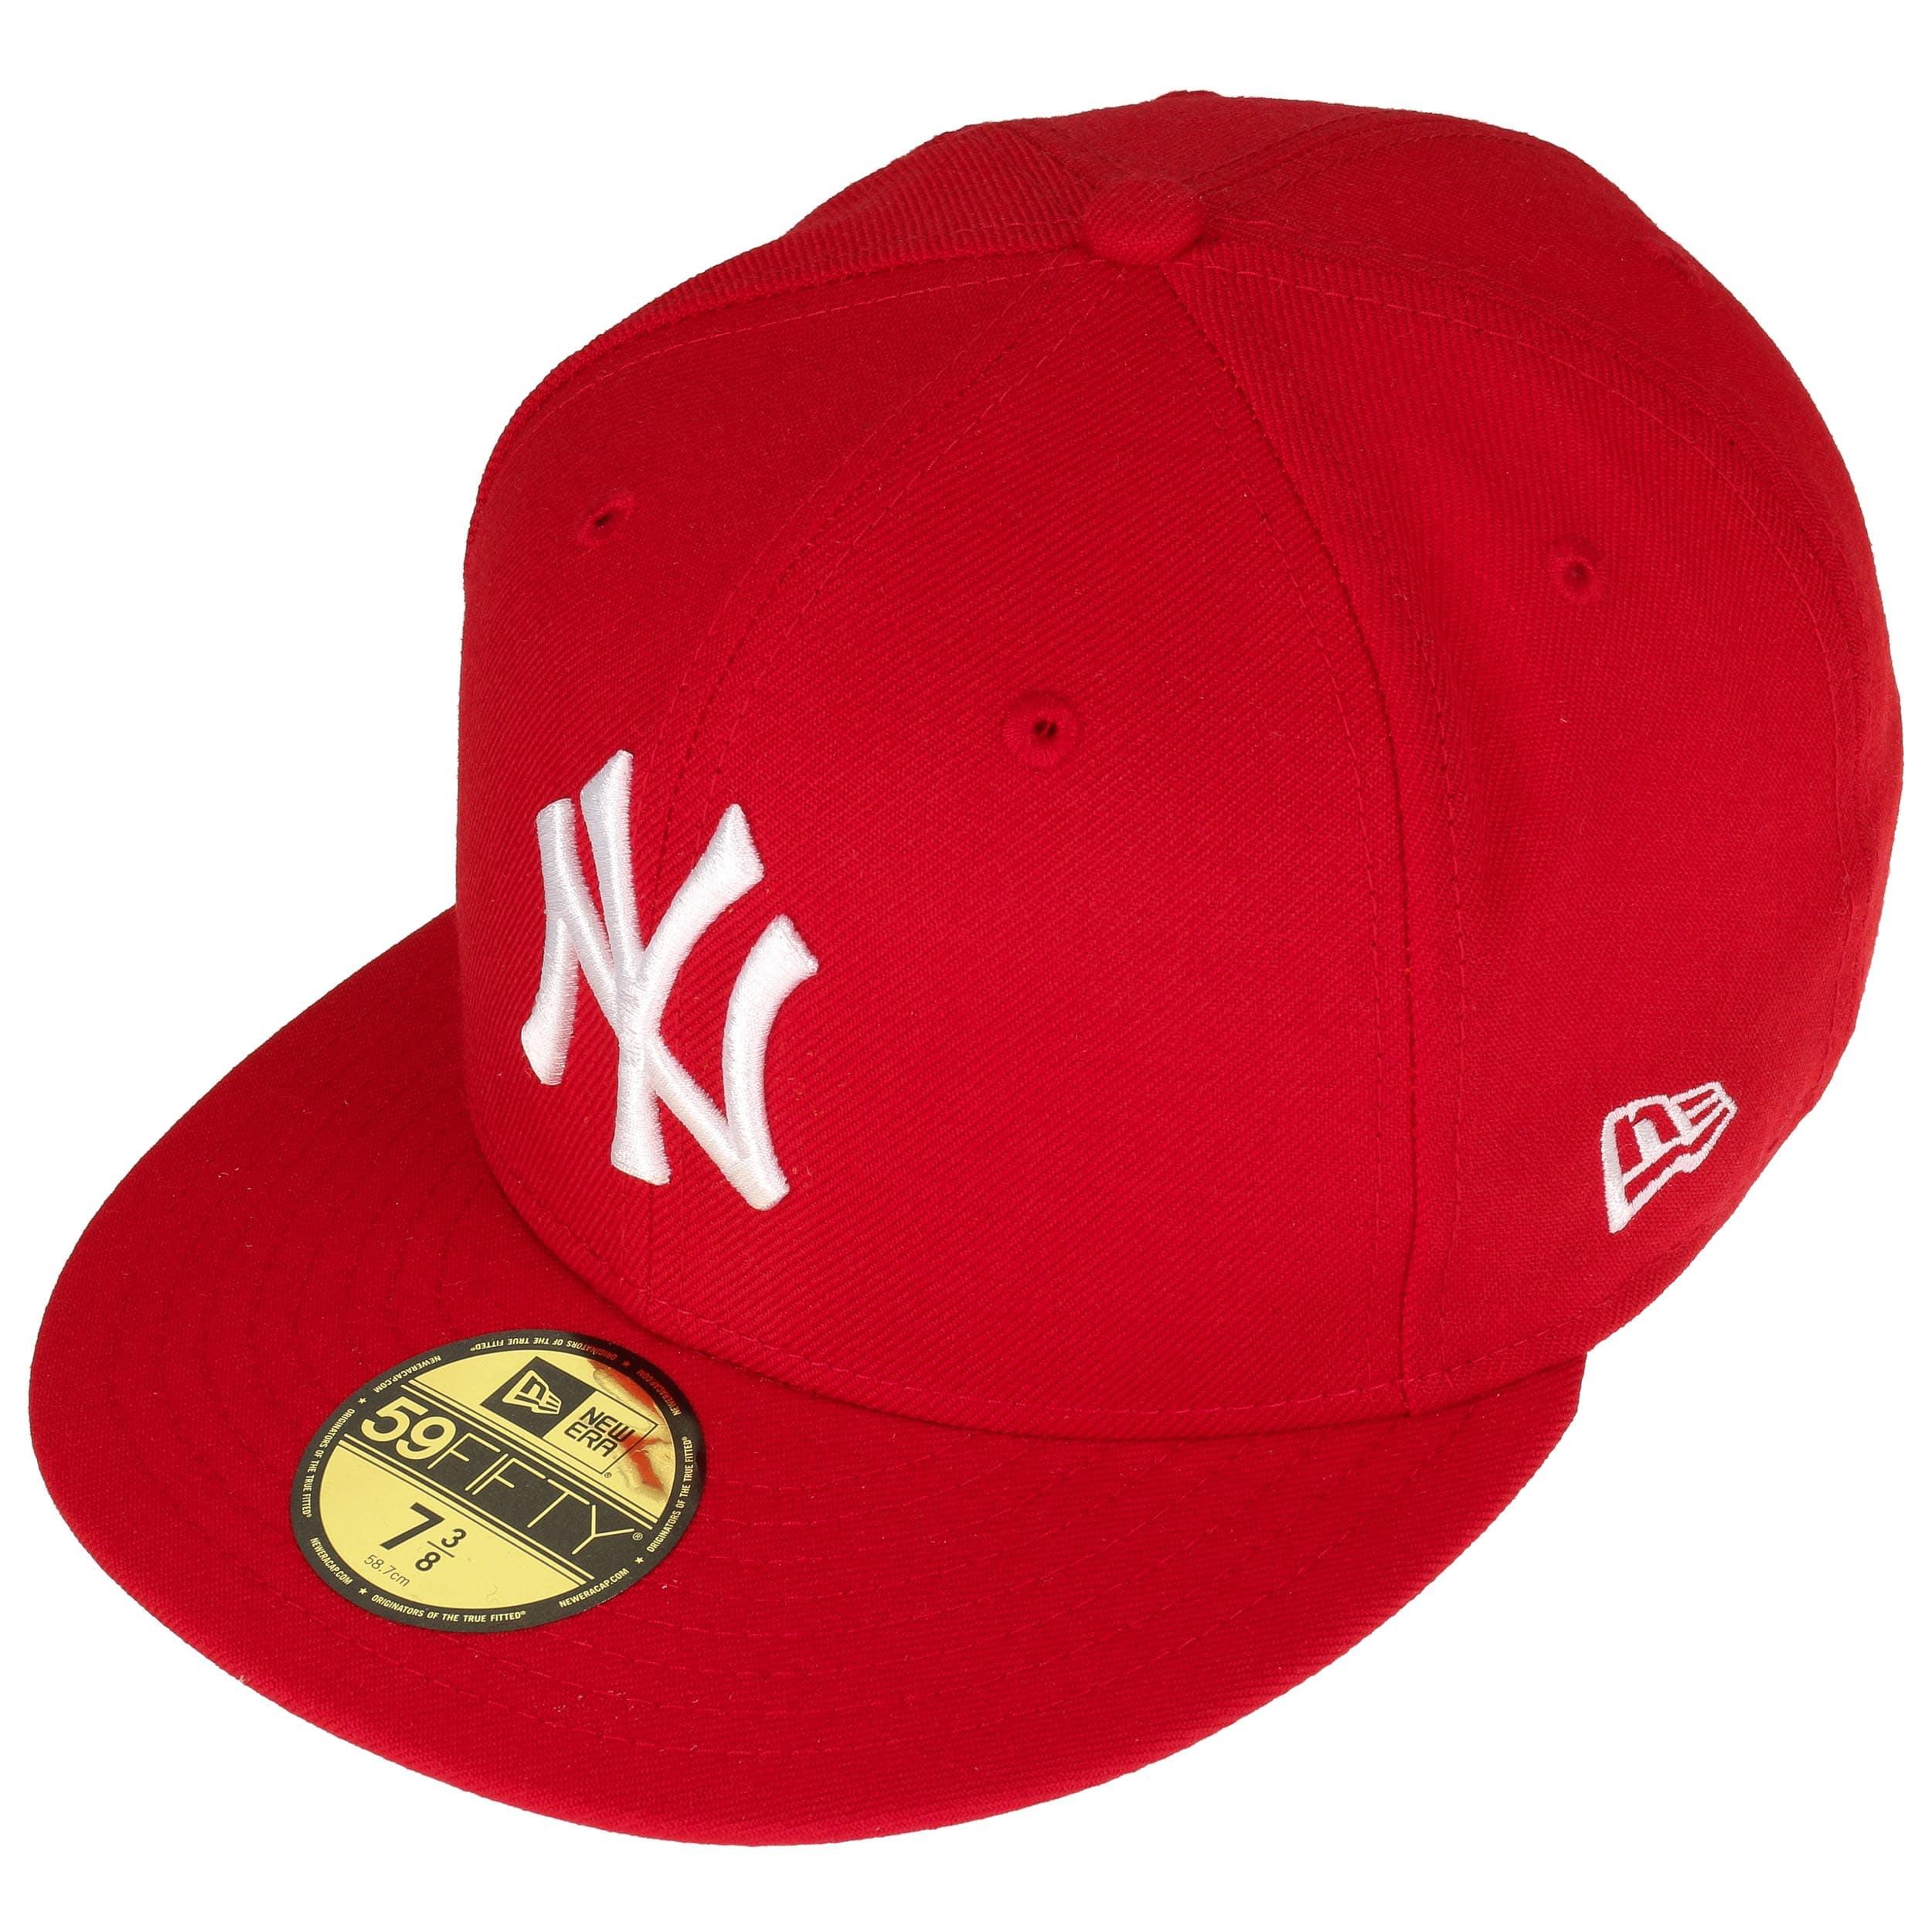 59Fifty Gorra MLB Basic NY by New Era - Gorras - sombreroshop.es adc913dad2d